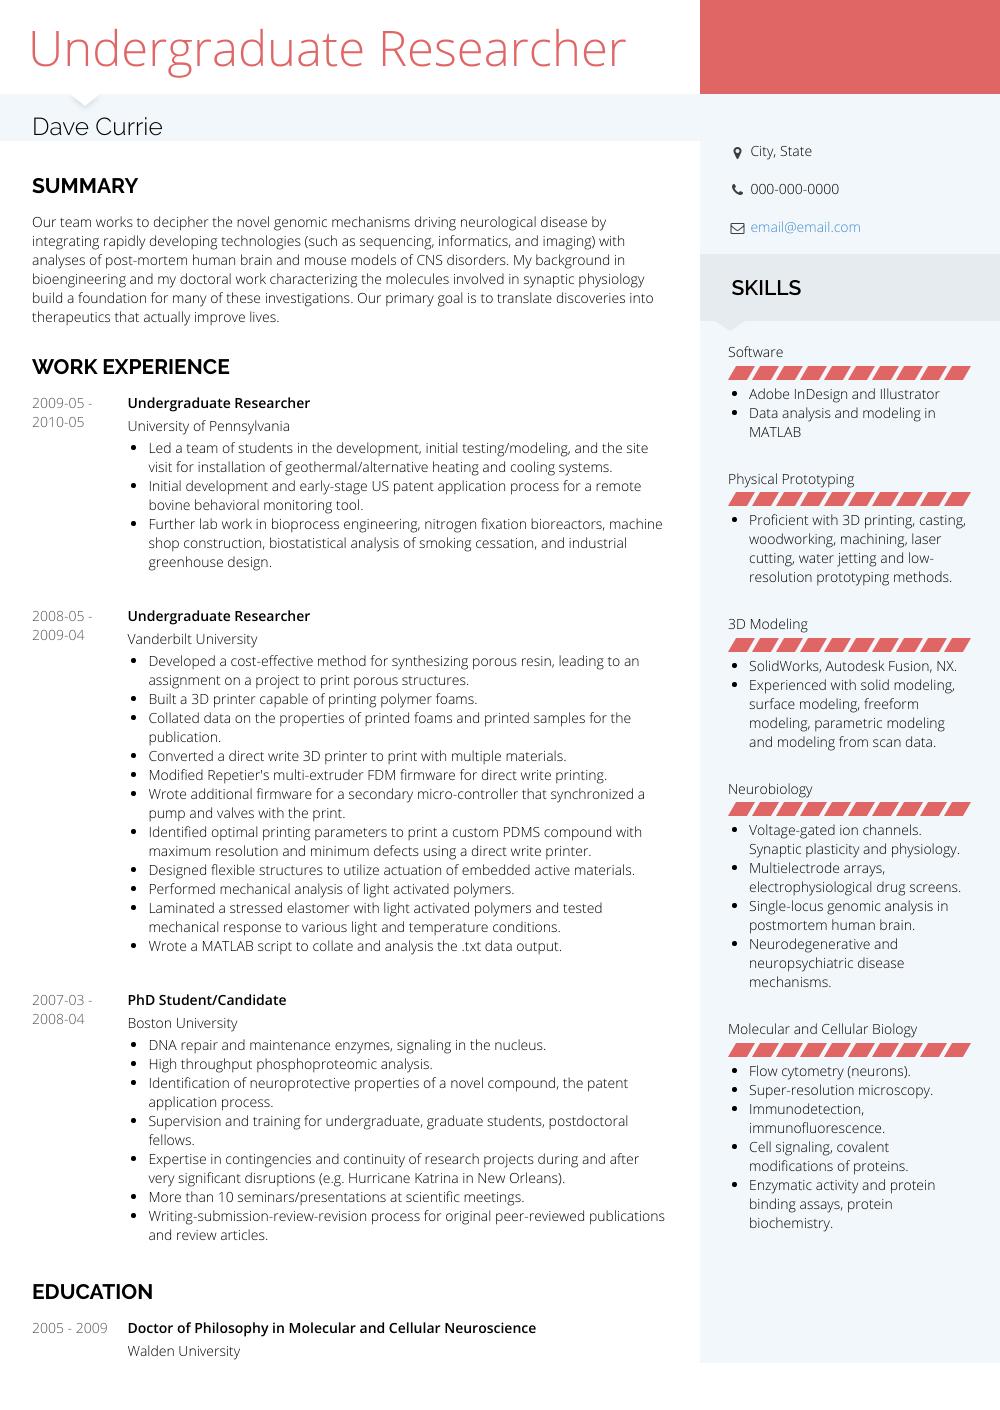 Undergraduate Researcher Resume Sample and Template